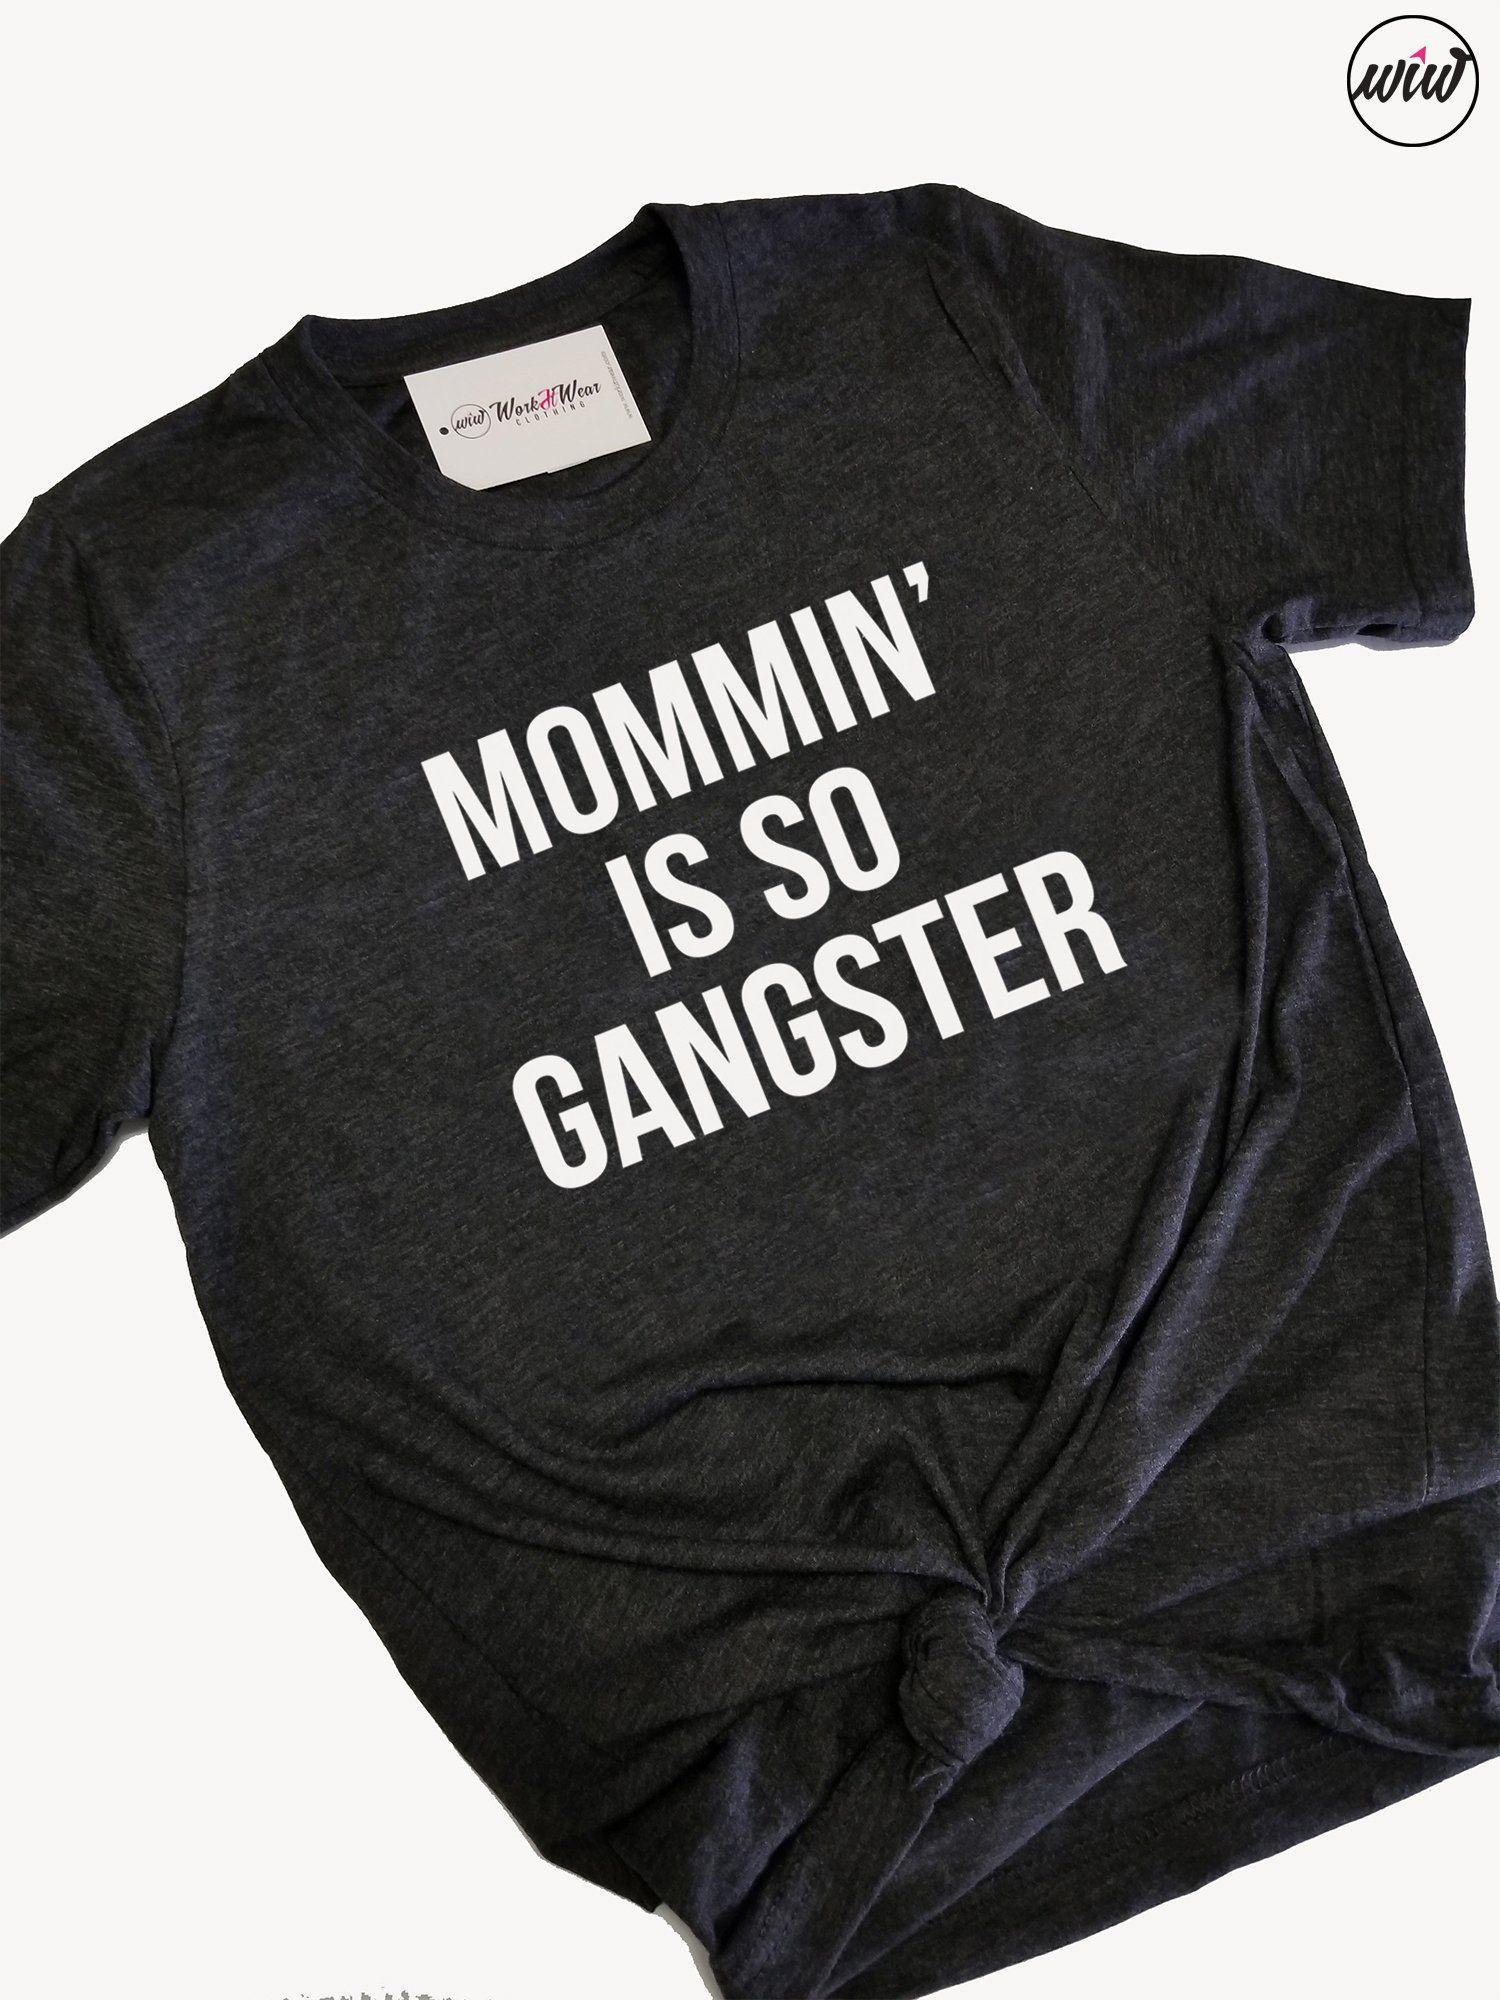 ed7faca530e MOMMIN Is So Gangster Shirt. Gangsta Rap. Mom Life Shirt. Mom Boss. Target  Mom Shirt. Mom Shirt. Mama Shirt. Gangster Mom. Funny Mom Shirt.